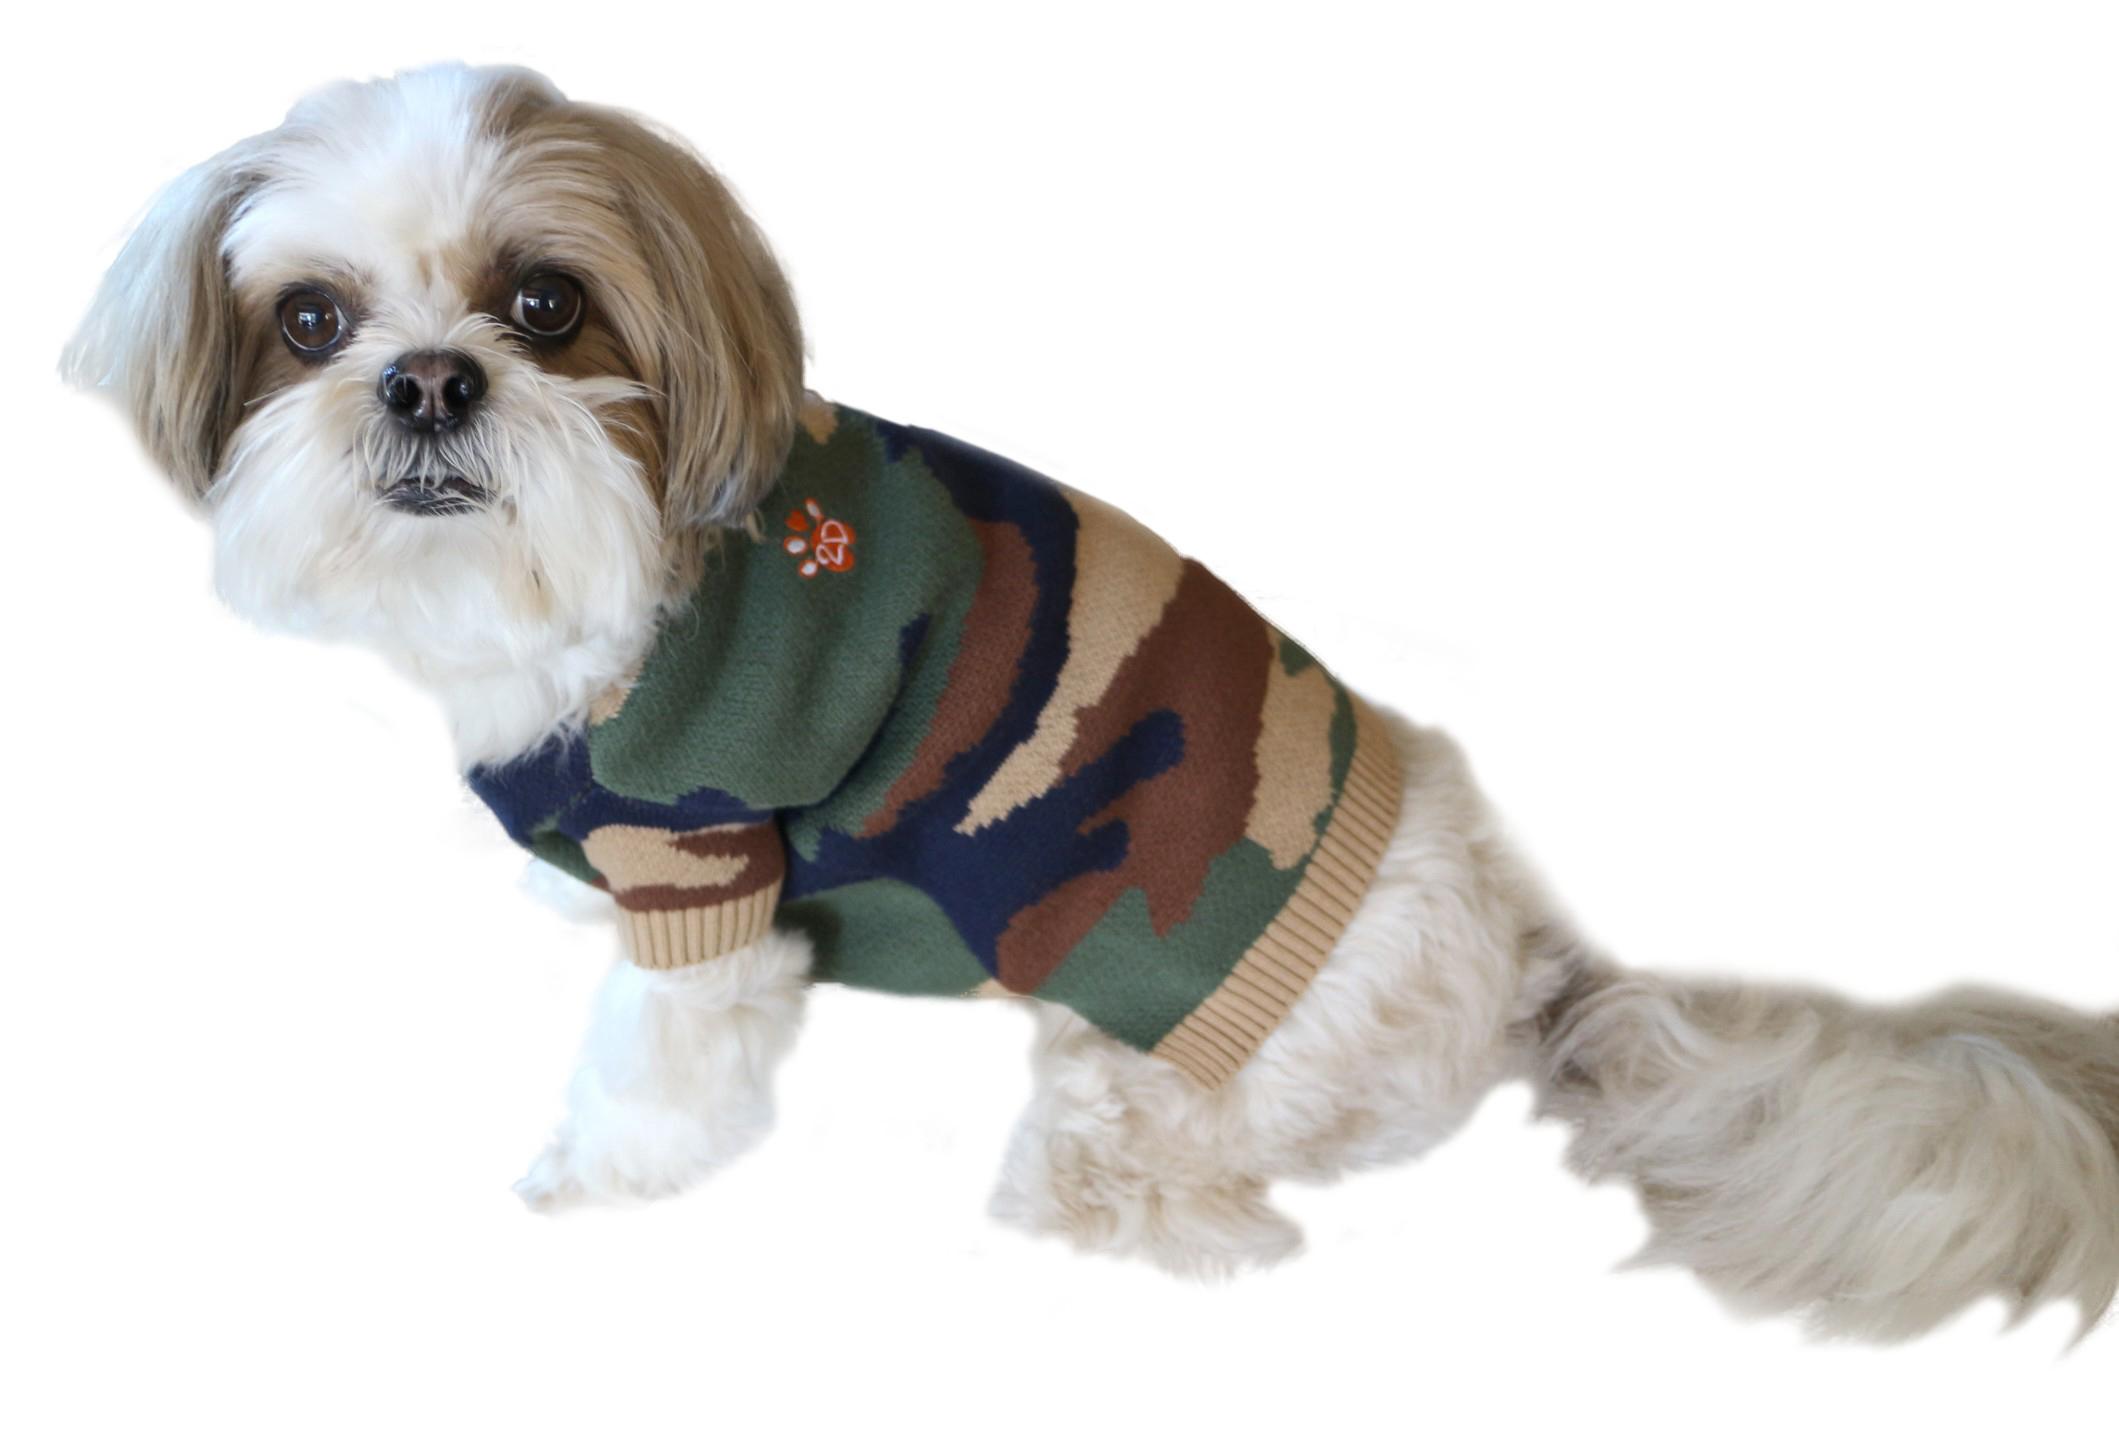 doggydolly w355 strickpullover f r hunde camouflage xs brust 31 33 cm r cken 18 20 cm w355 2. Black Bedroom Furniture Sets. Home Design Ideas